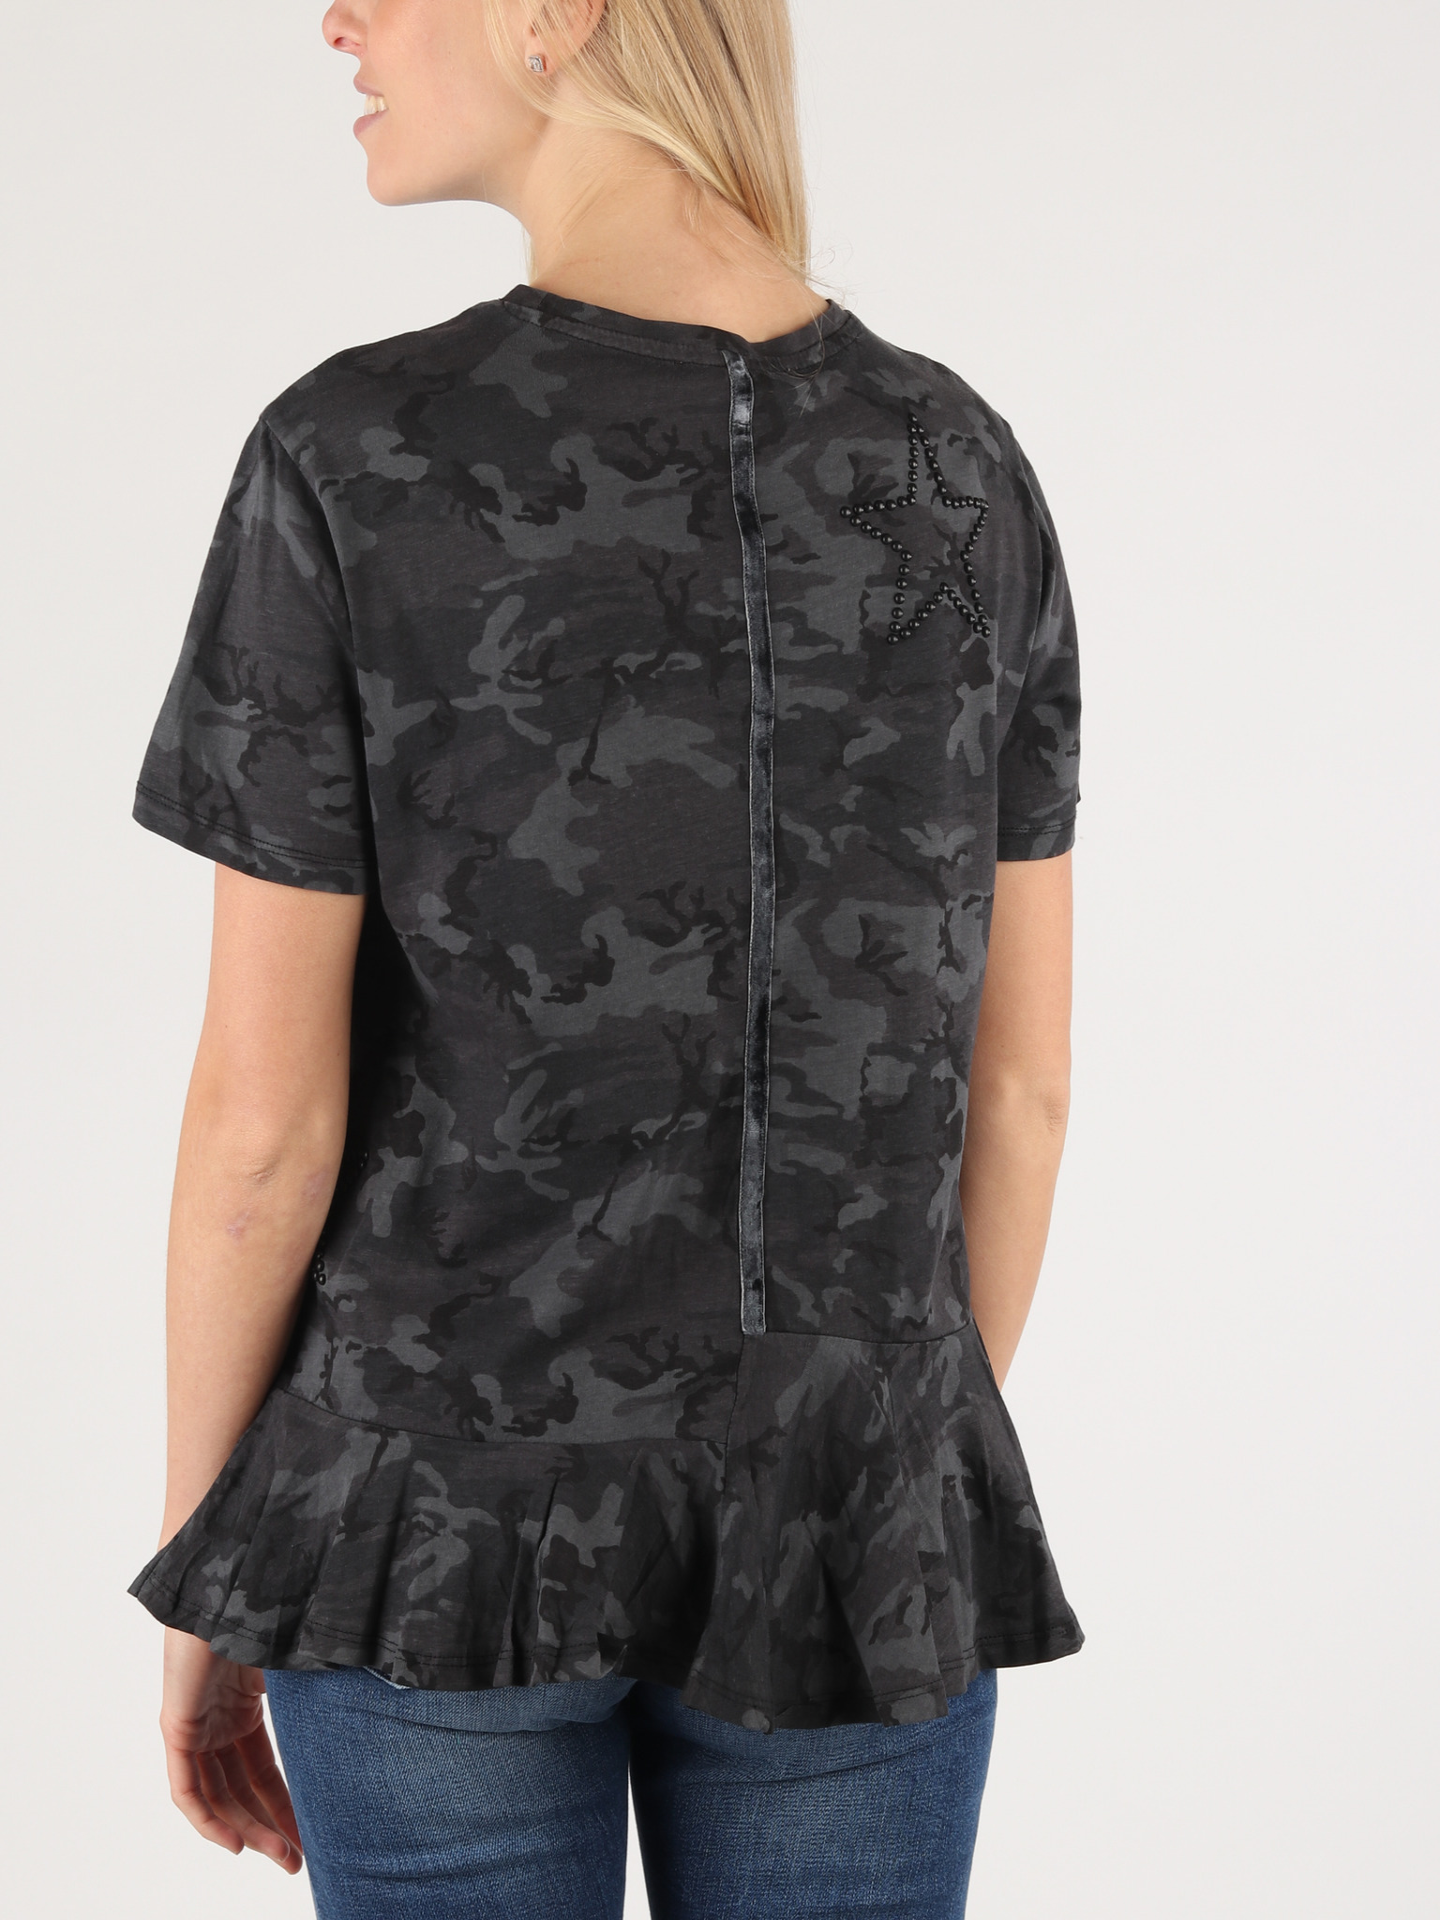 Tricouri pentru femei Replay - negru